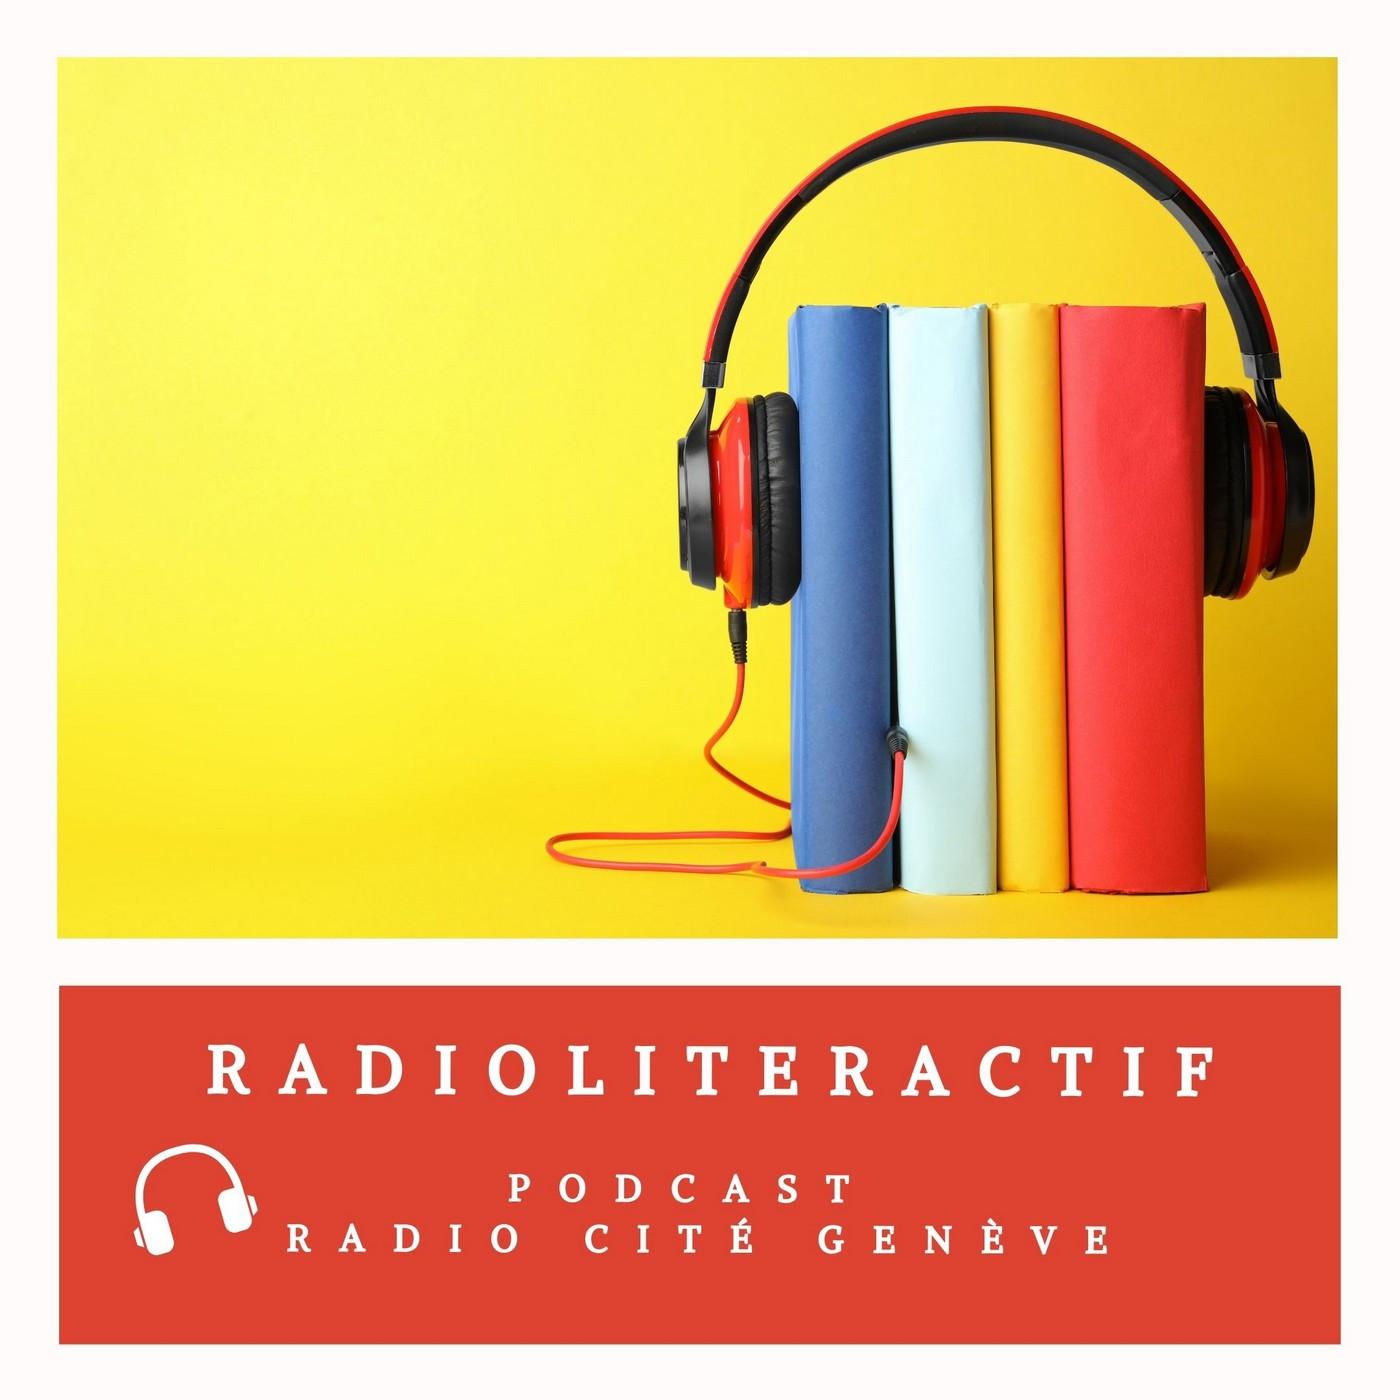 Radioliteractif